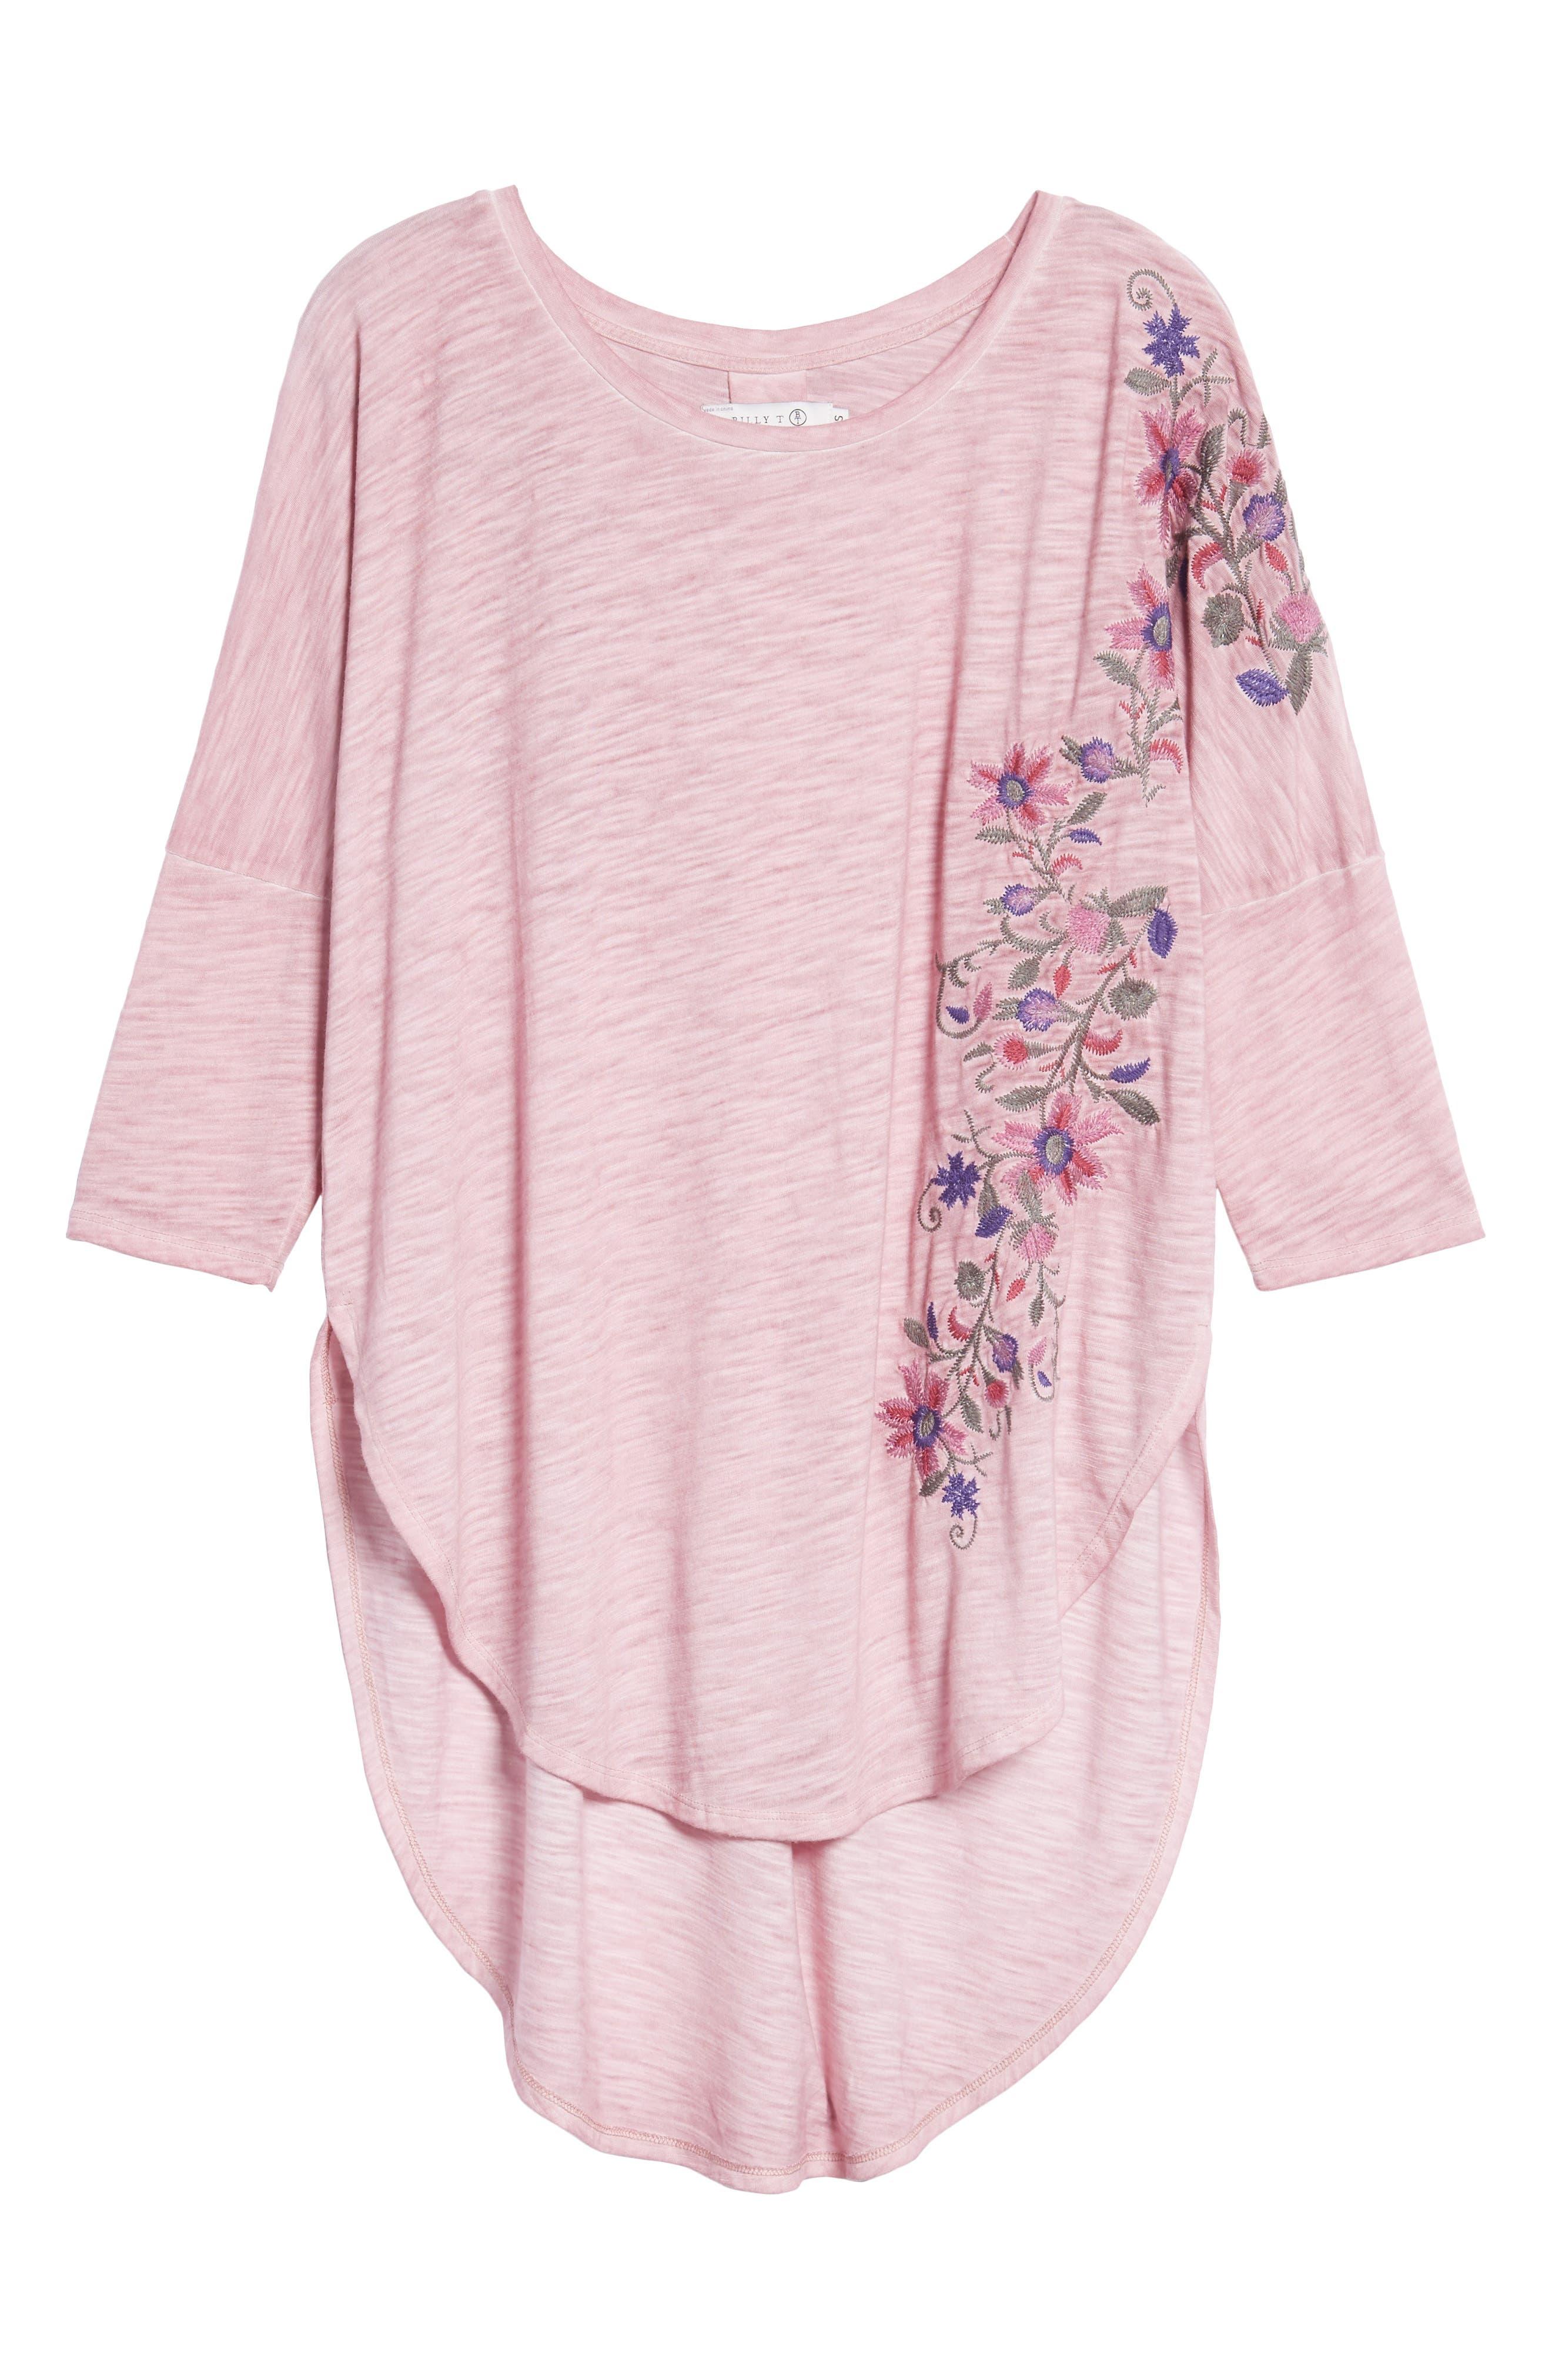 Embroidered Slub Knit Top,                             Alternate thumbnail 6, color,                             Dark Pink